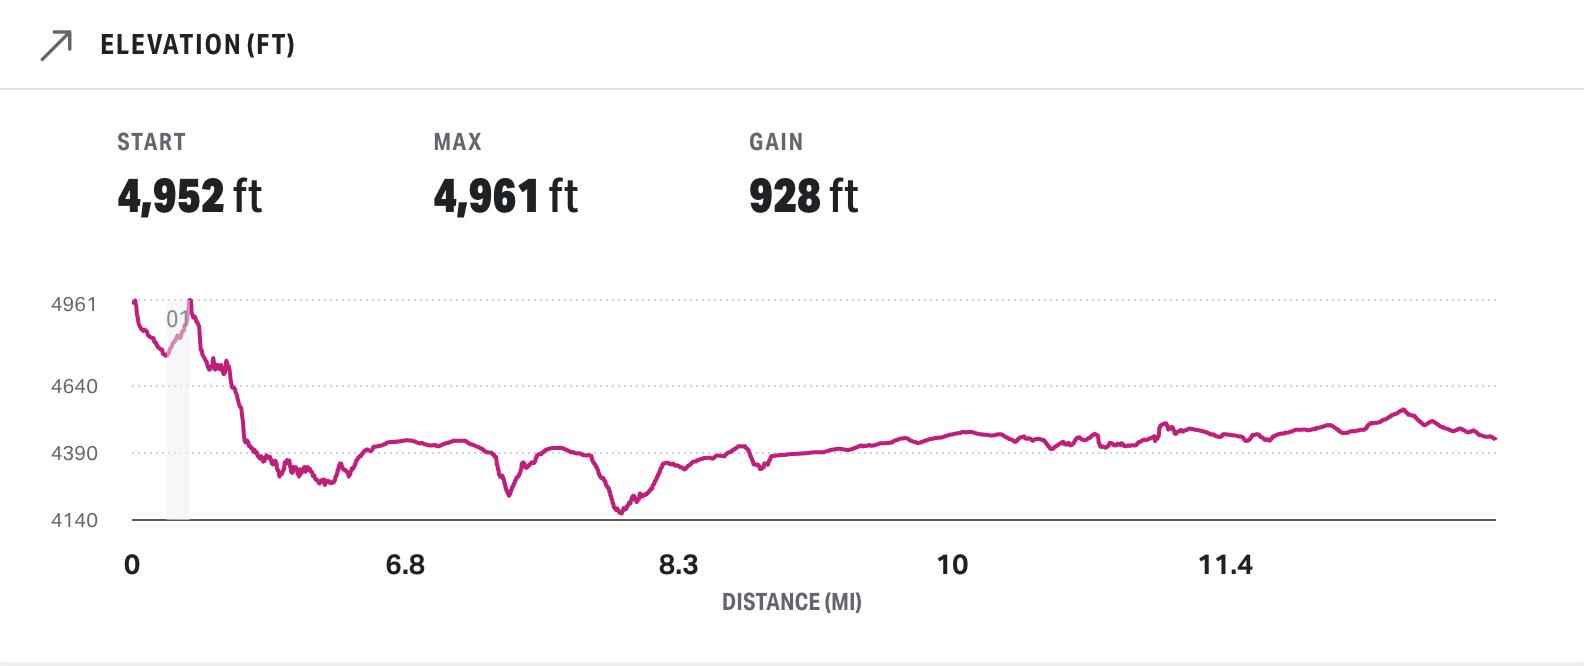 New 2021 Zion Half Marathon Elevation Profile